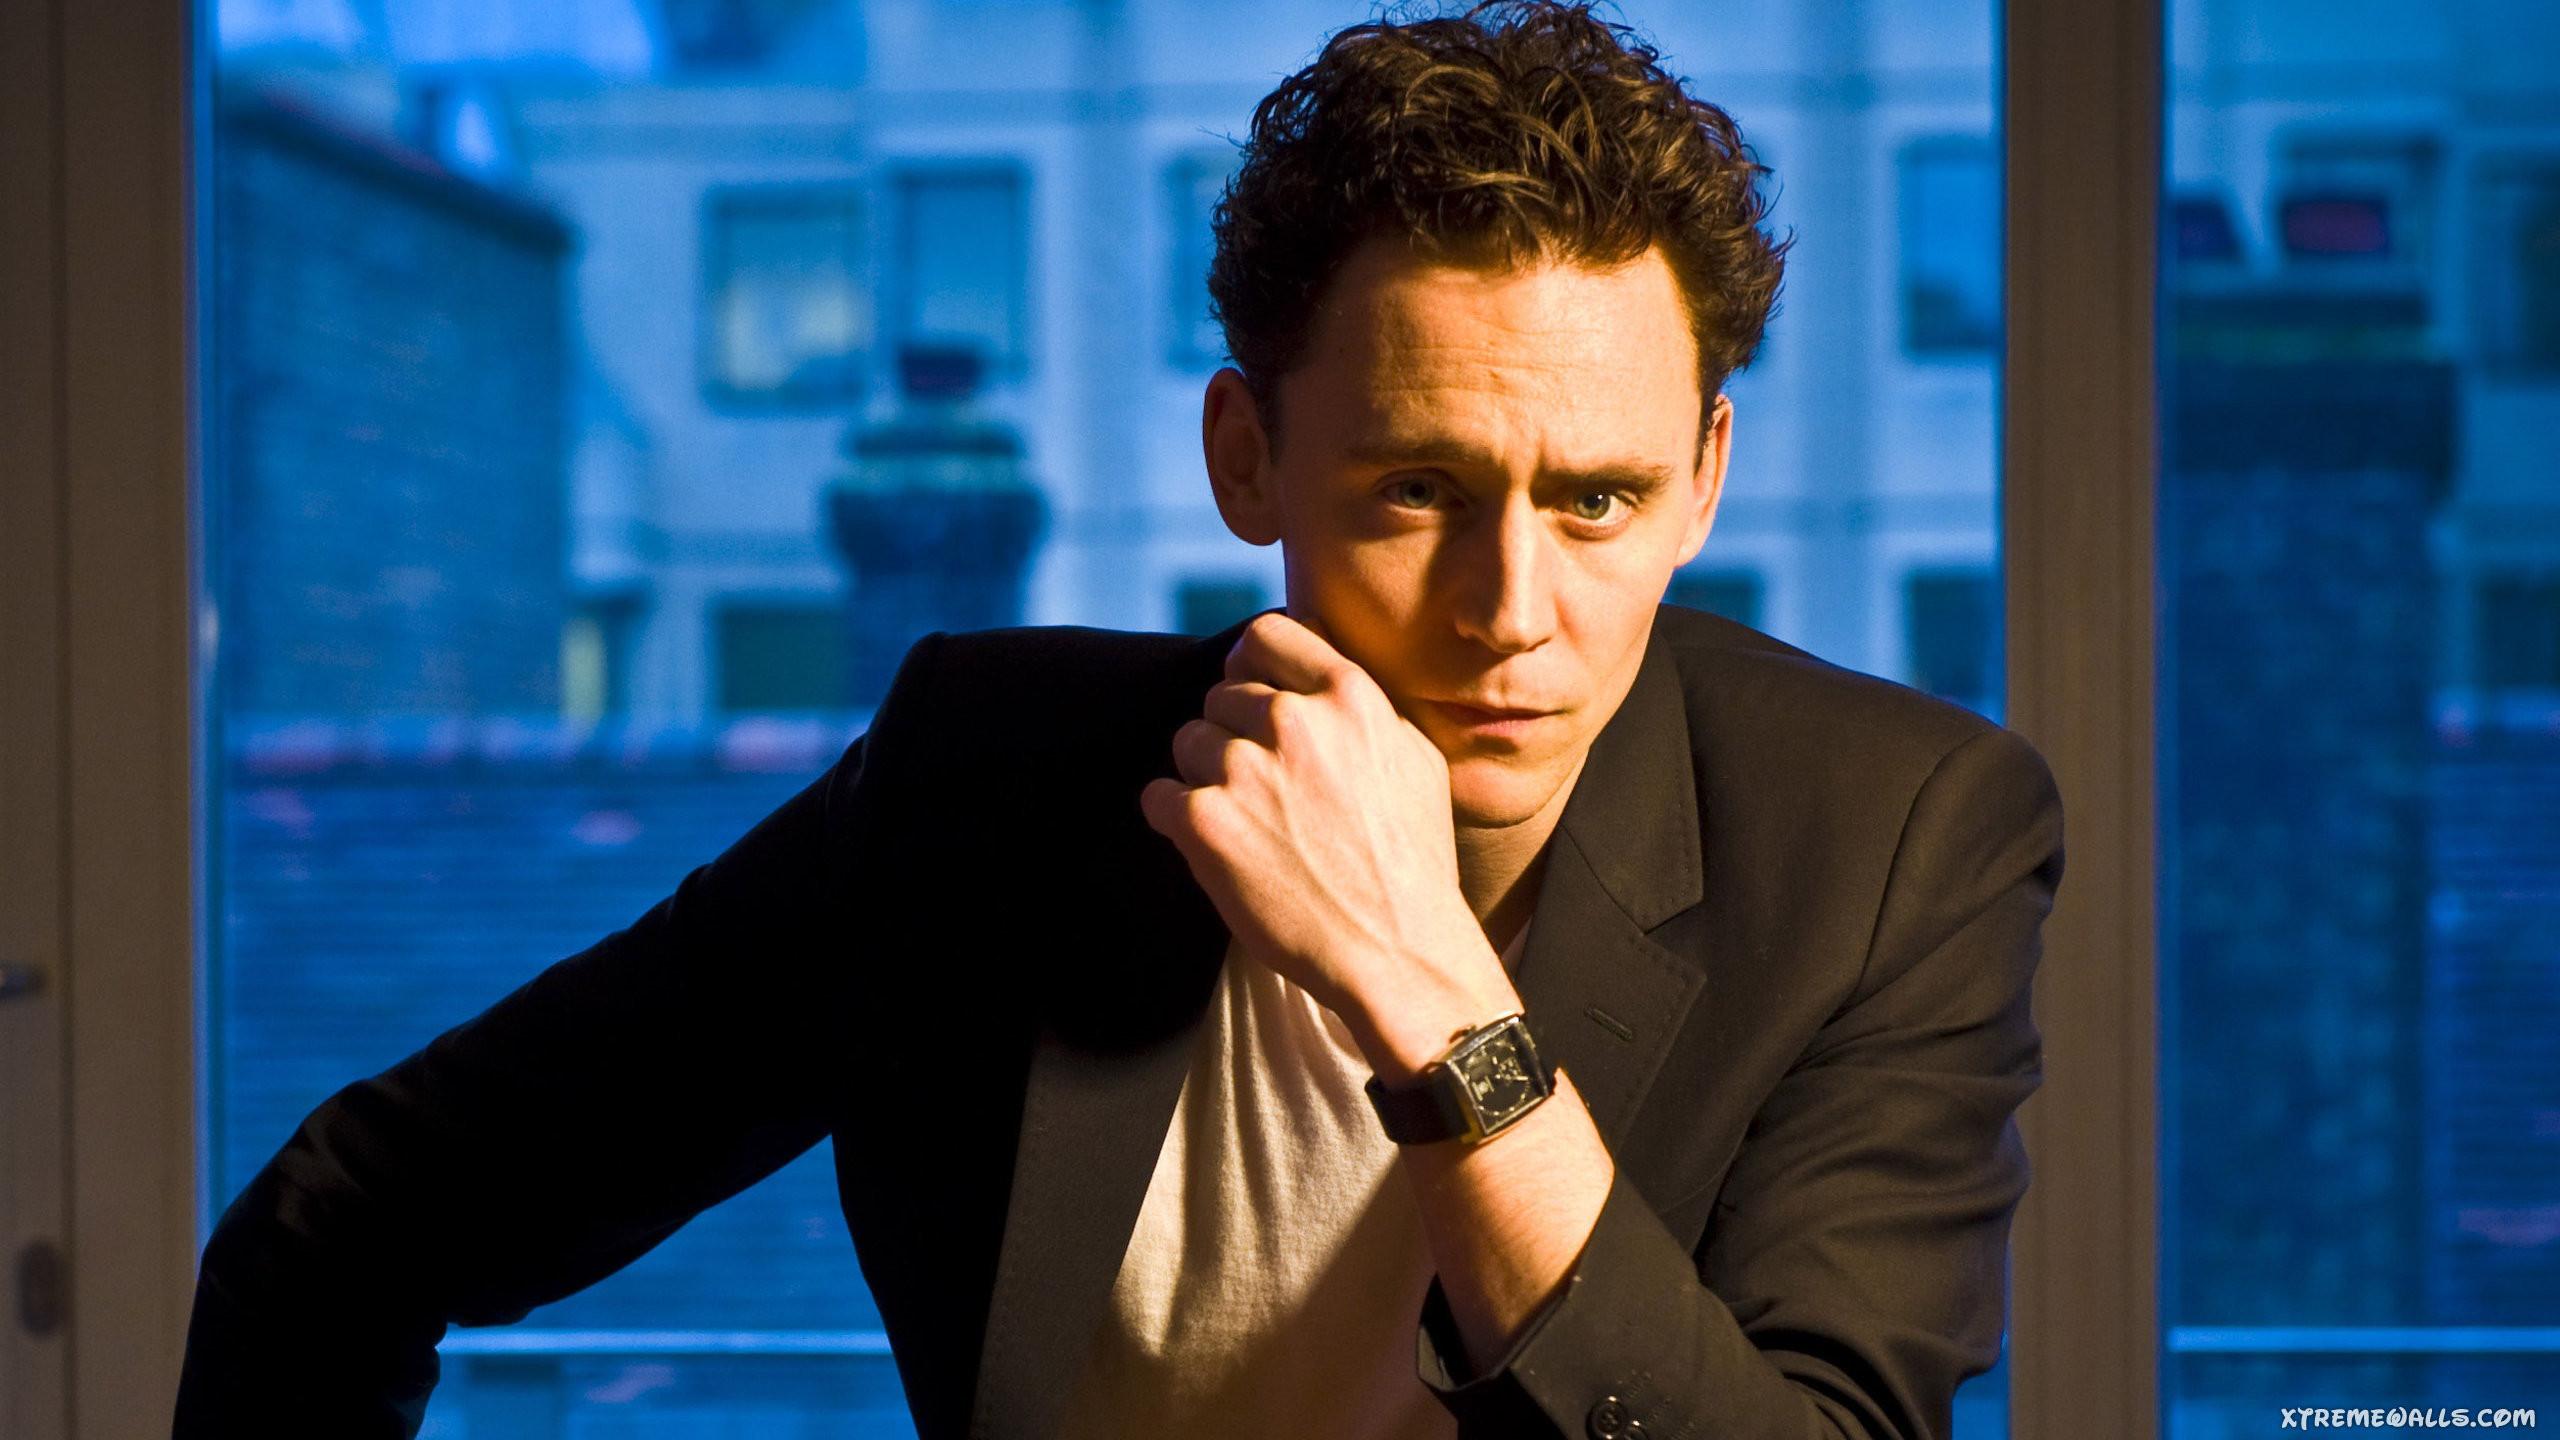 Tom Hiddleston HD Wallpaper #192